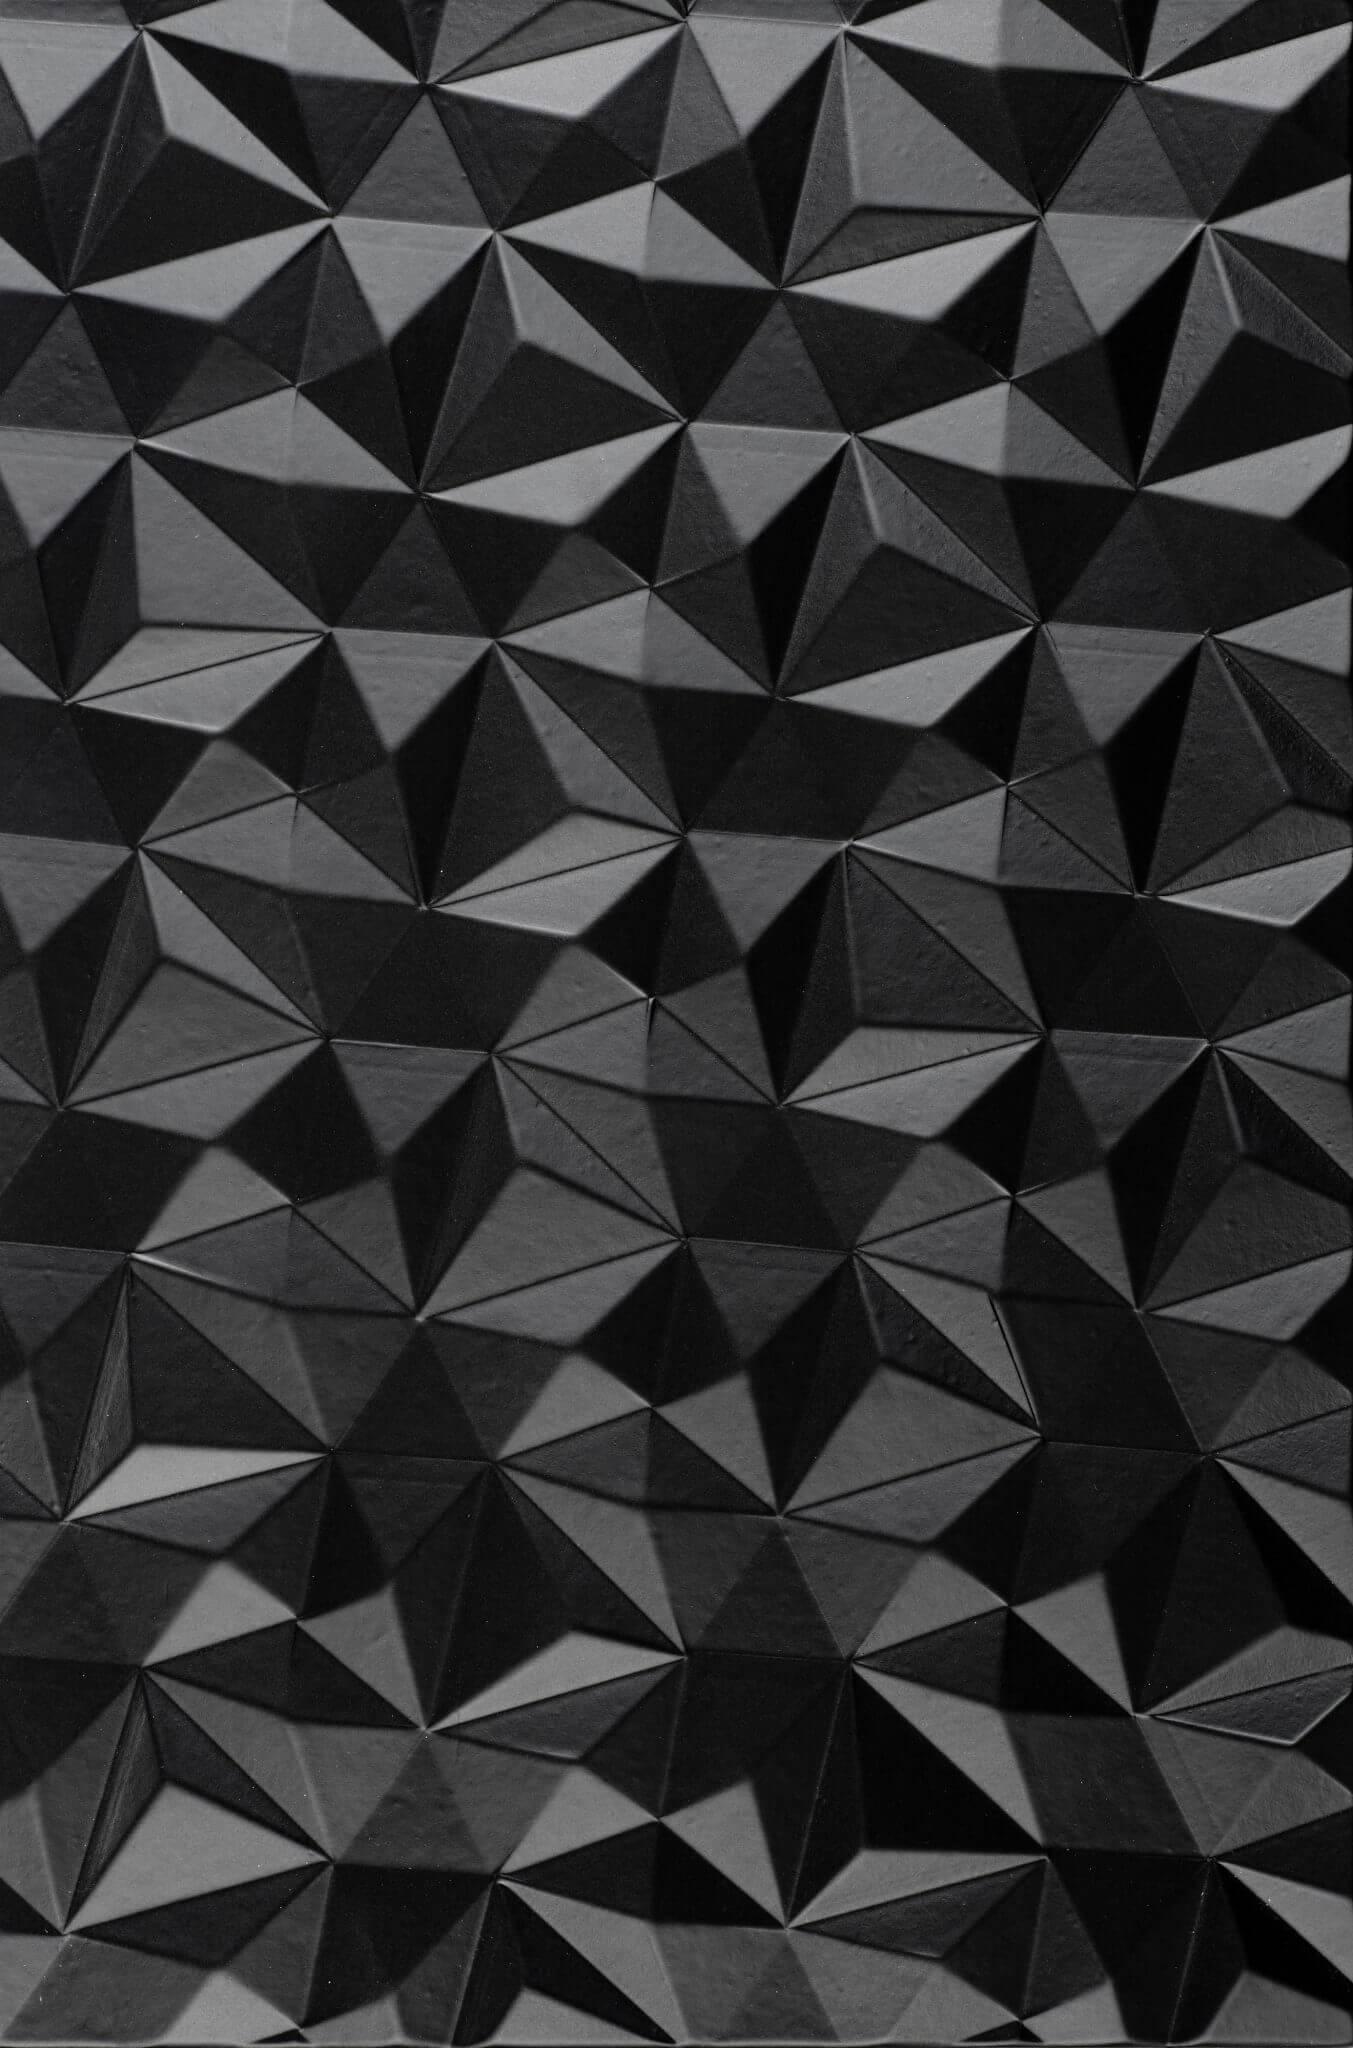 04_SmallDiamond_Black.